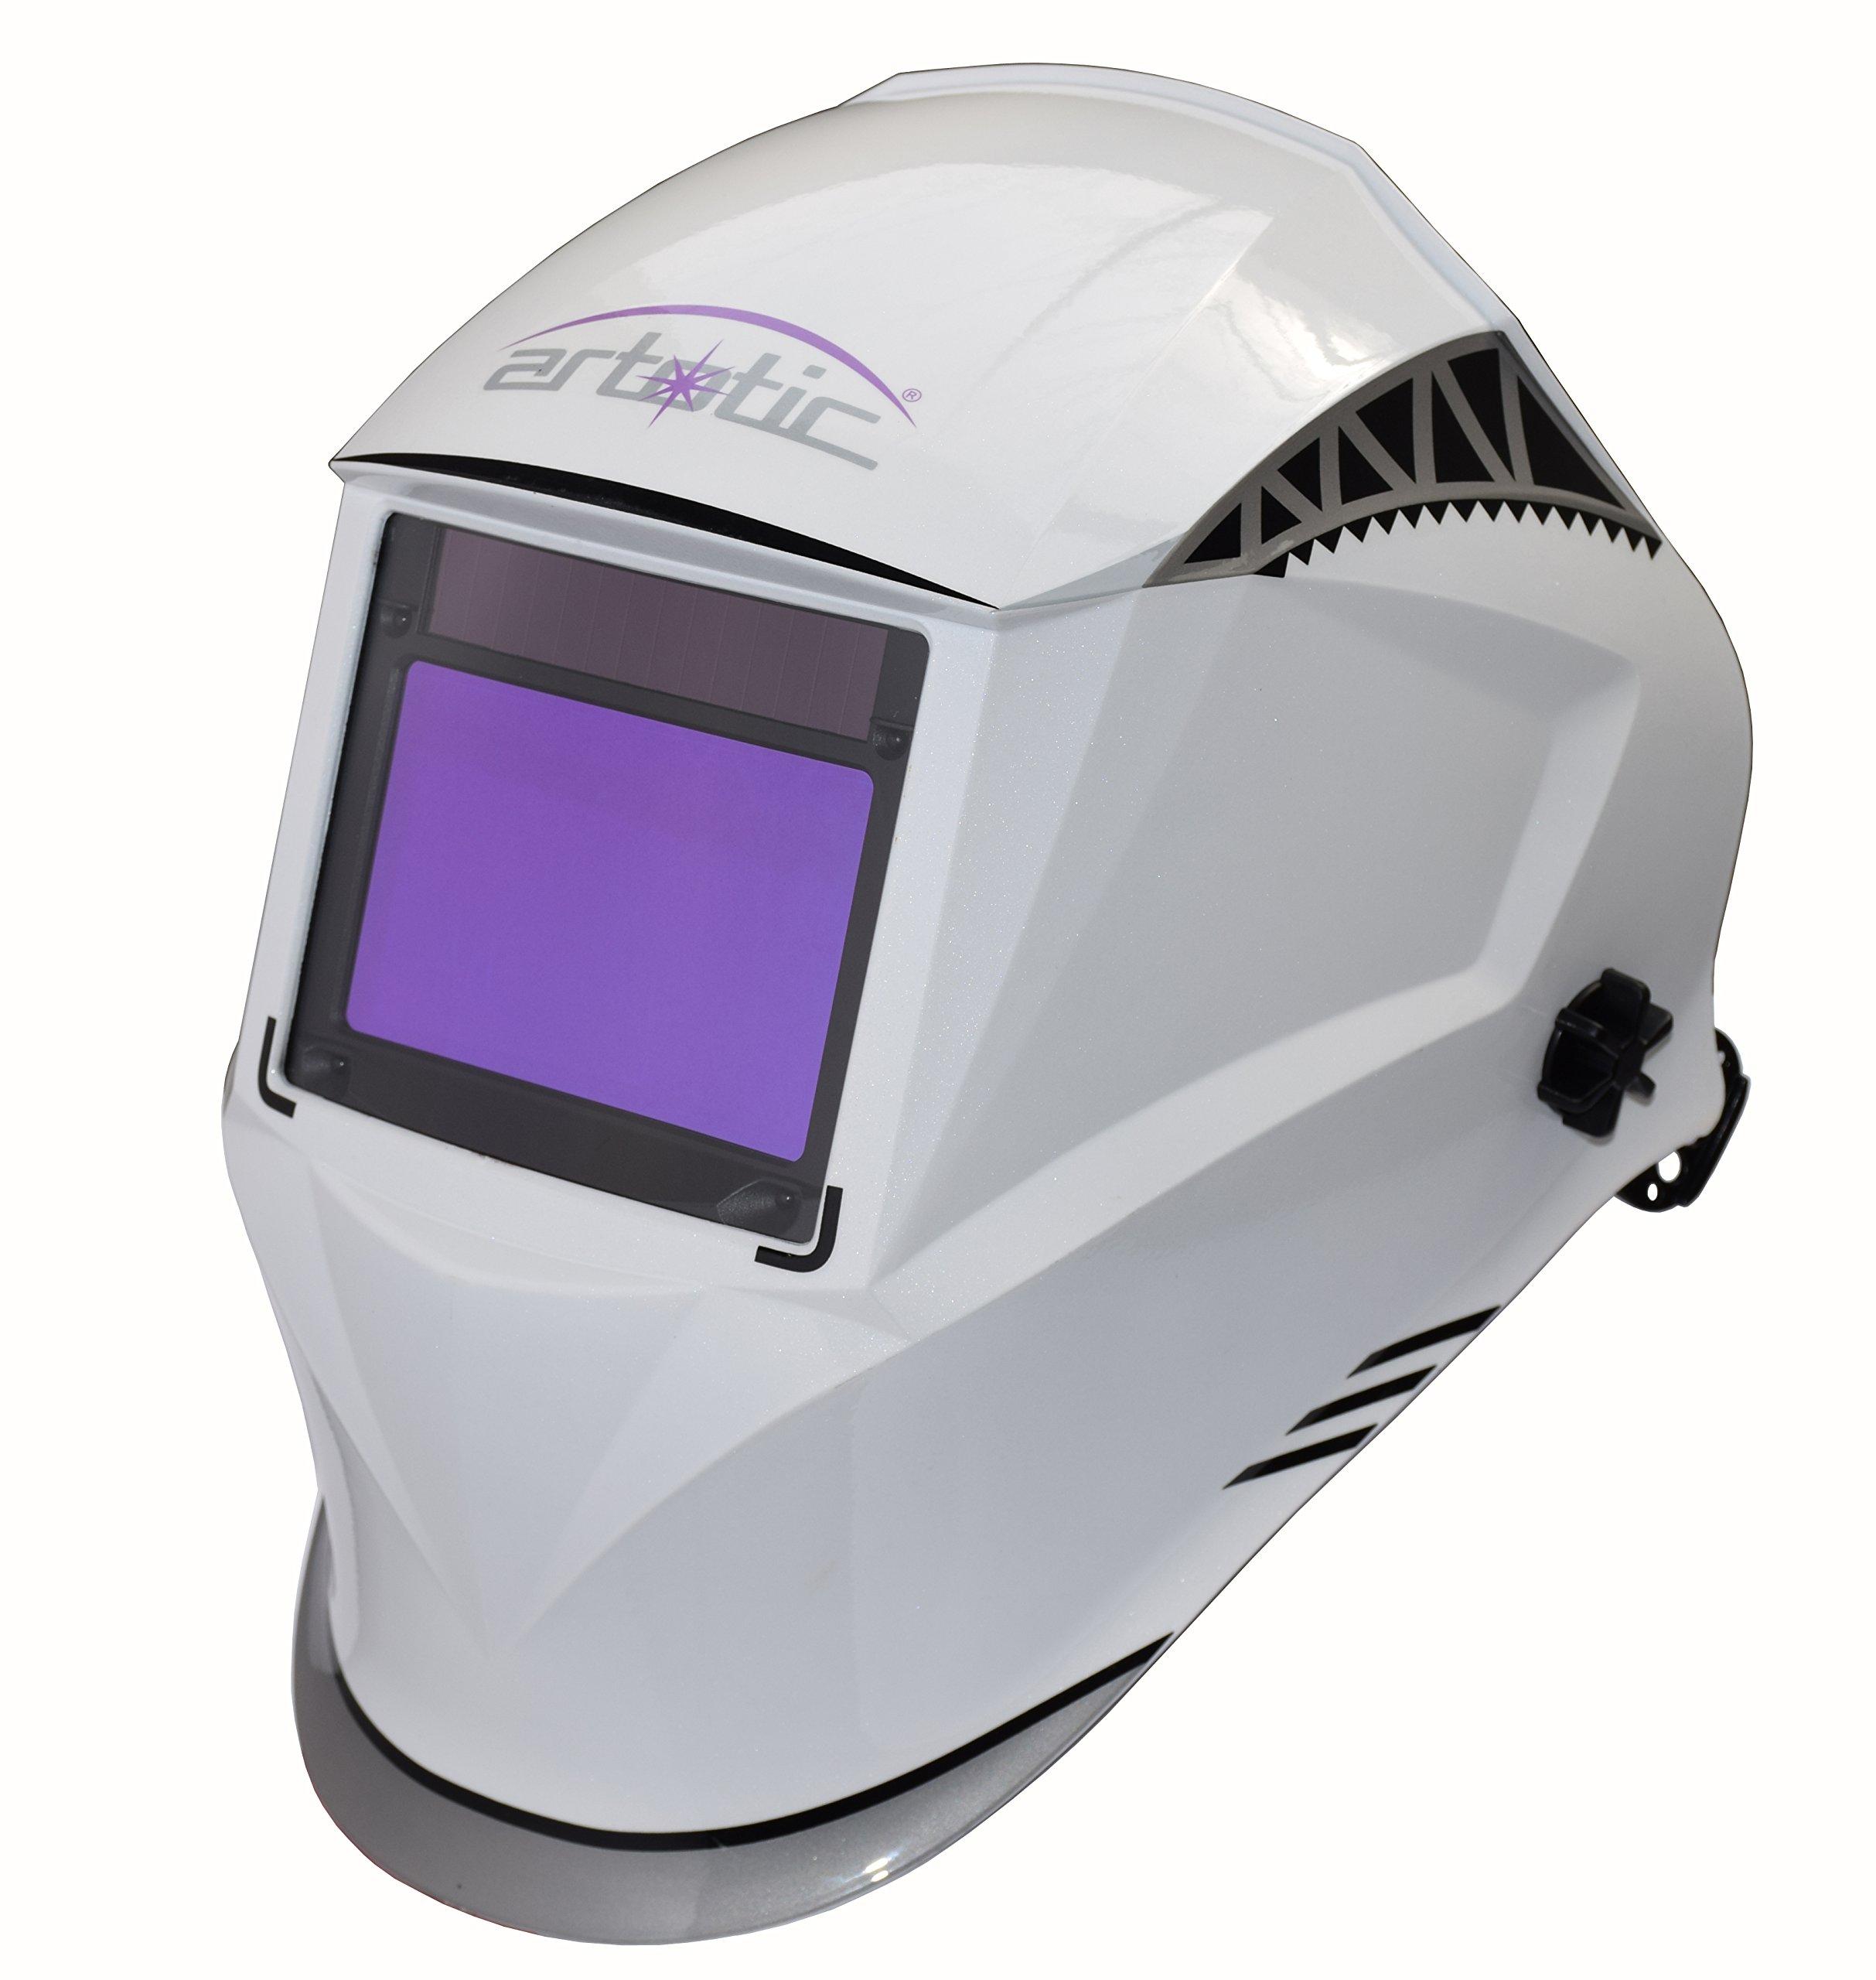 Artotic Master series auto darkening welding helmet, Shade range 3/4-13